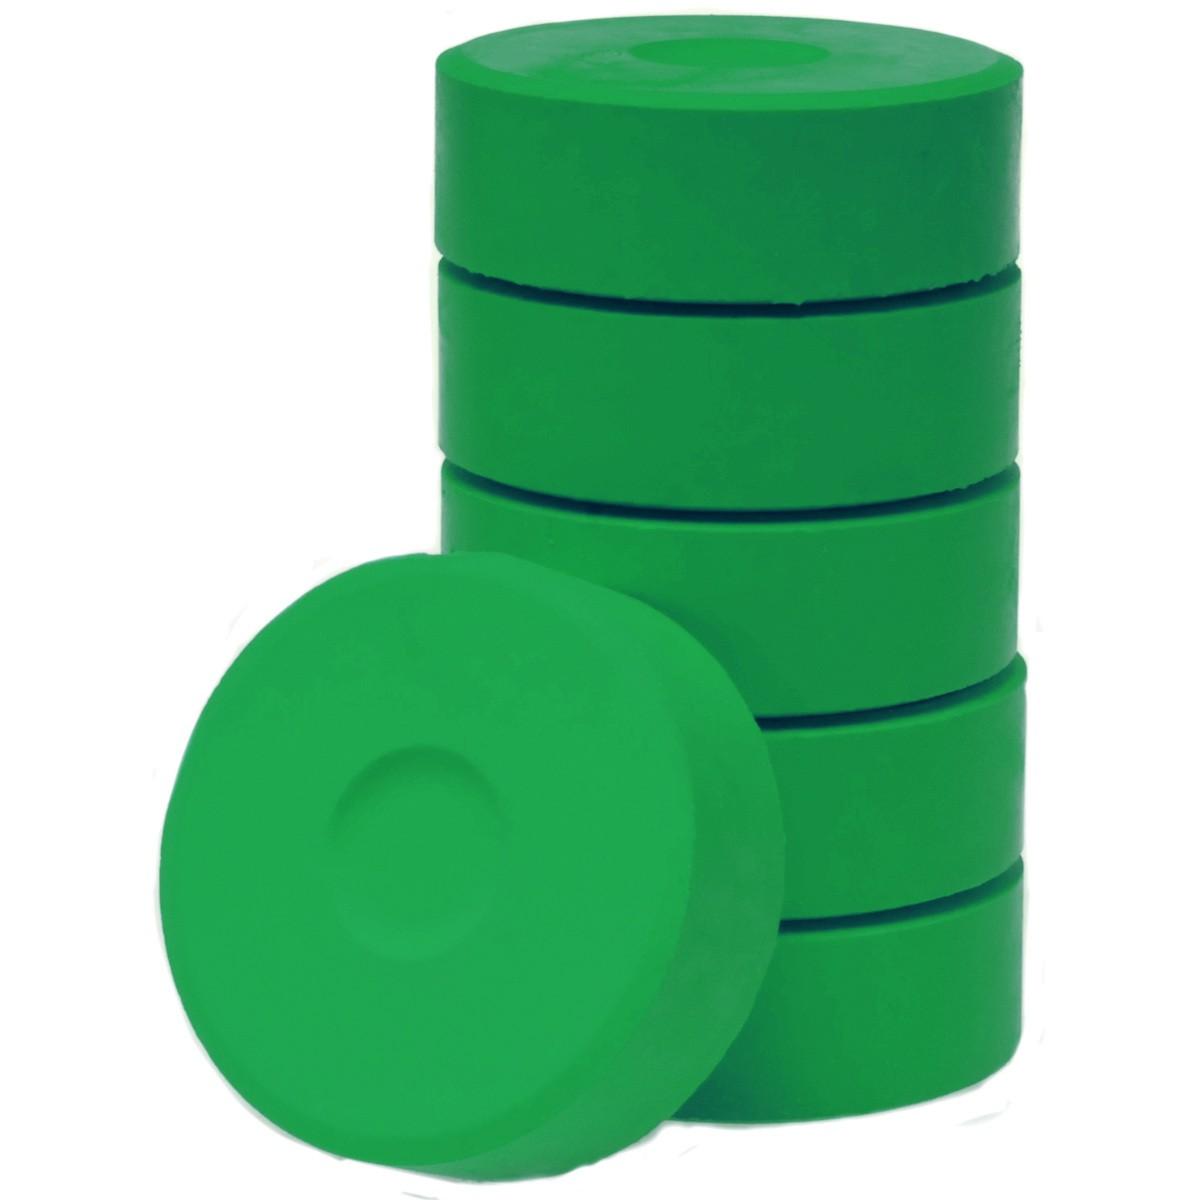 Tempera-Blöcke 55mm dunkelgrün 6 Stück - hochwertige Tempera Farb Pucks / Farbtabletten